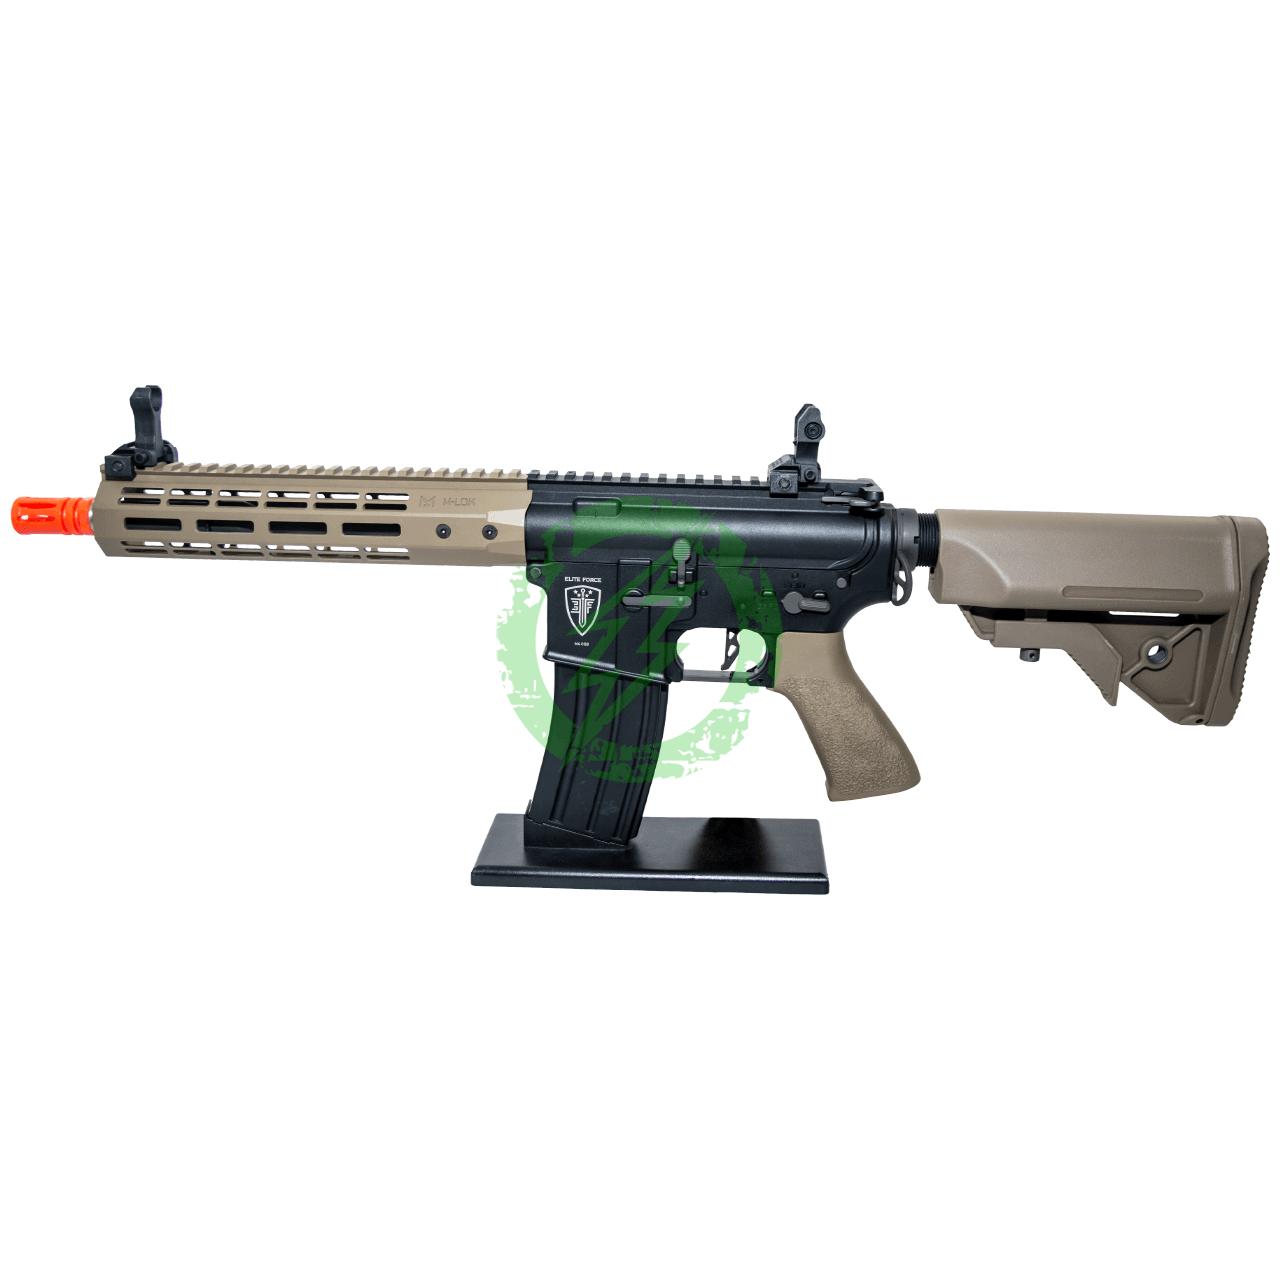 Umarex Elite Force Black & Tan CQB Competition M4 Airsoft AEG Rifle M-LOK Rail left